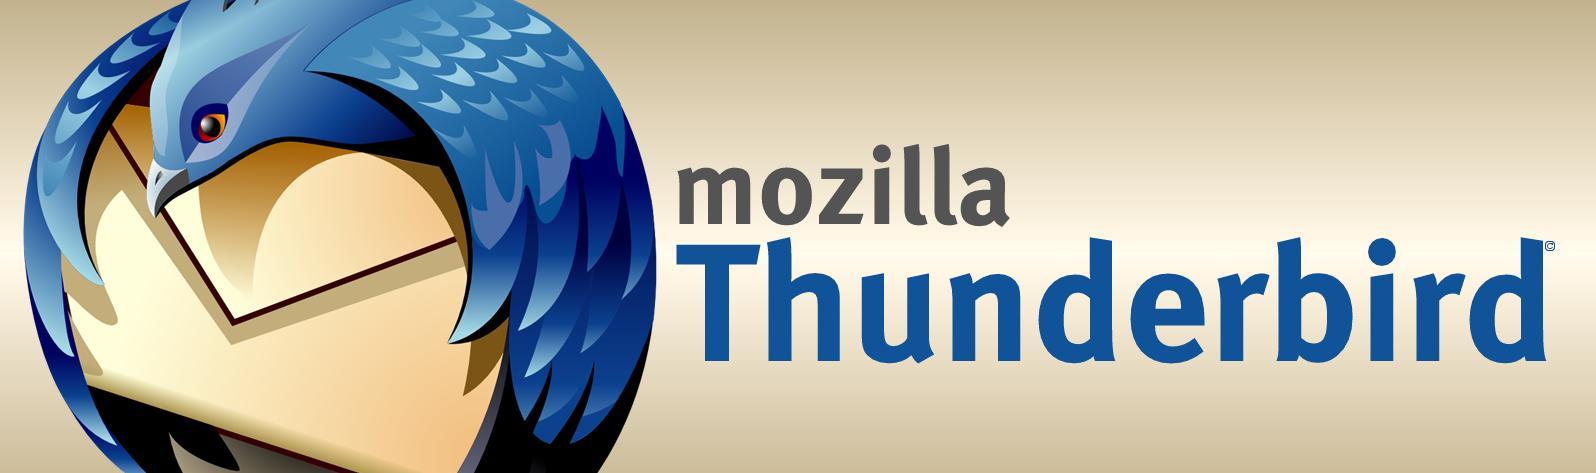 Mozilla Thunderbird Sticky